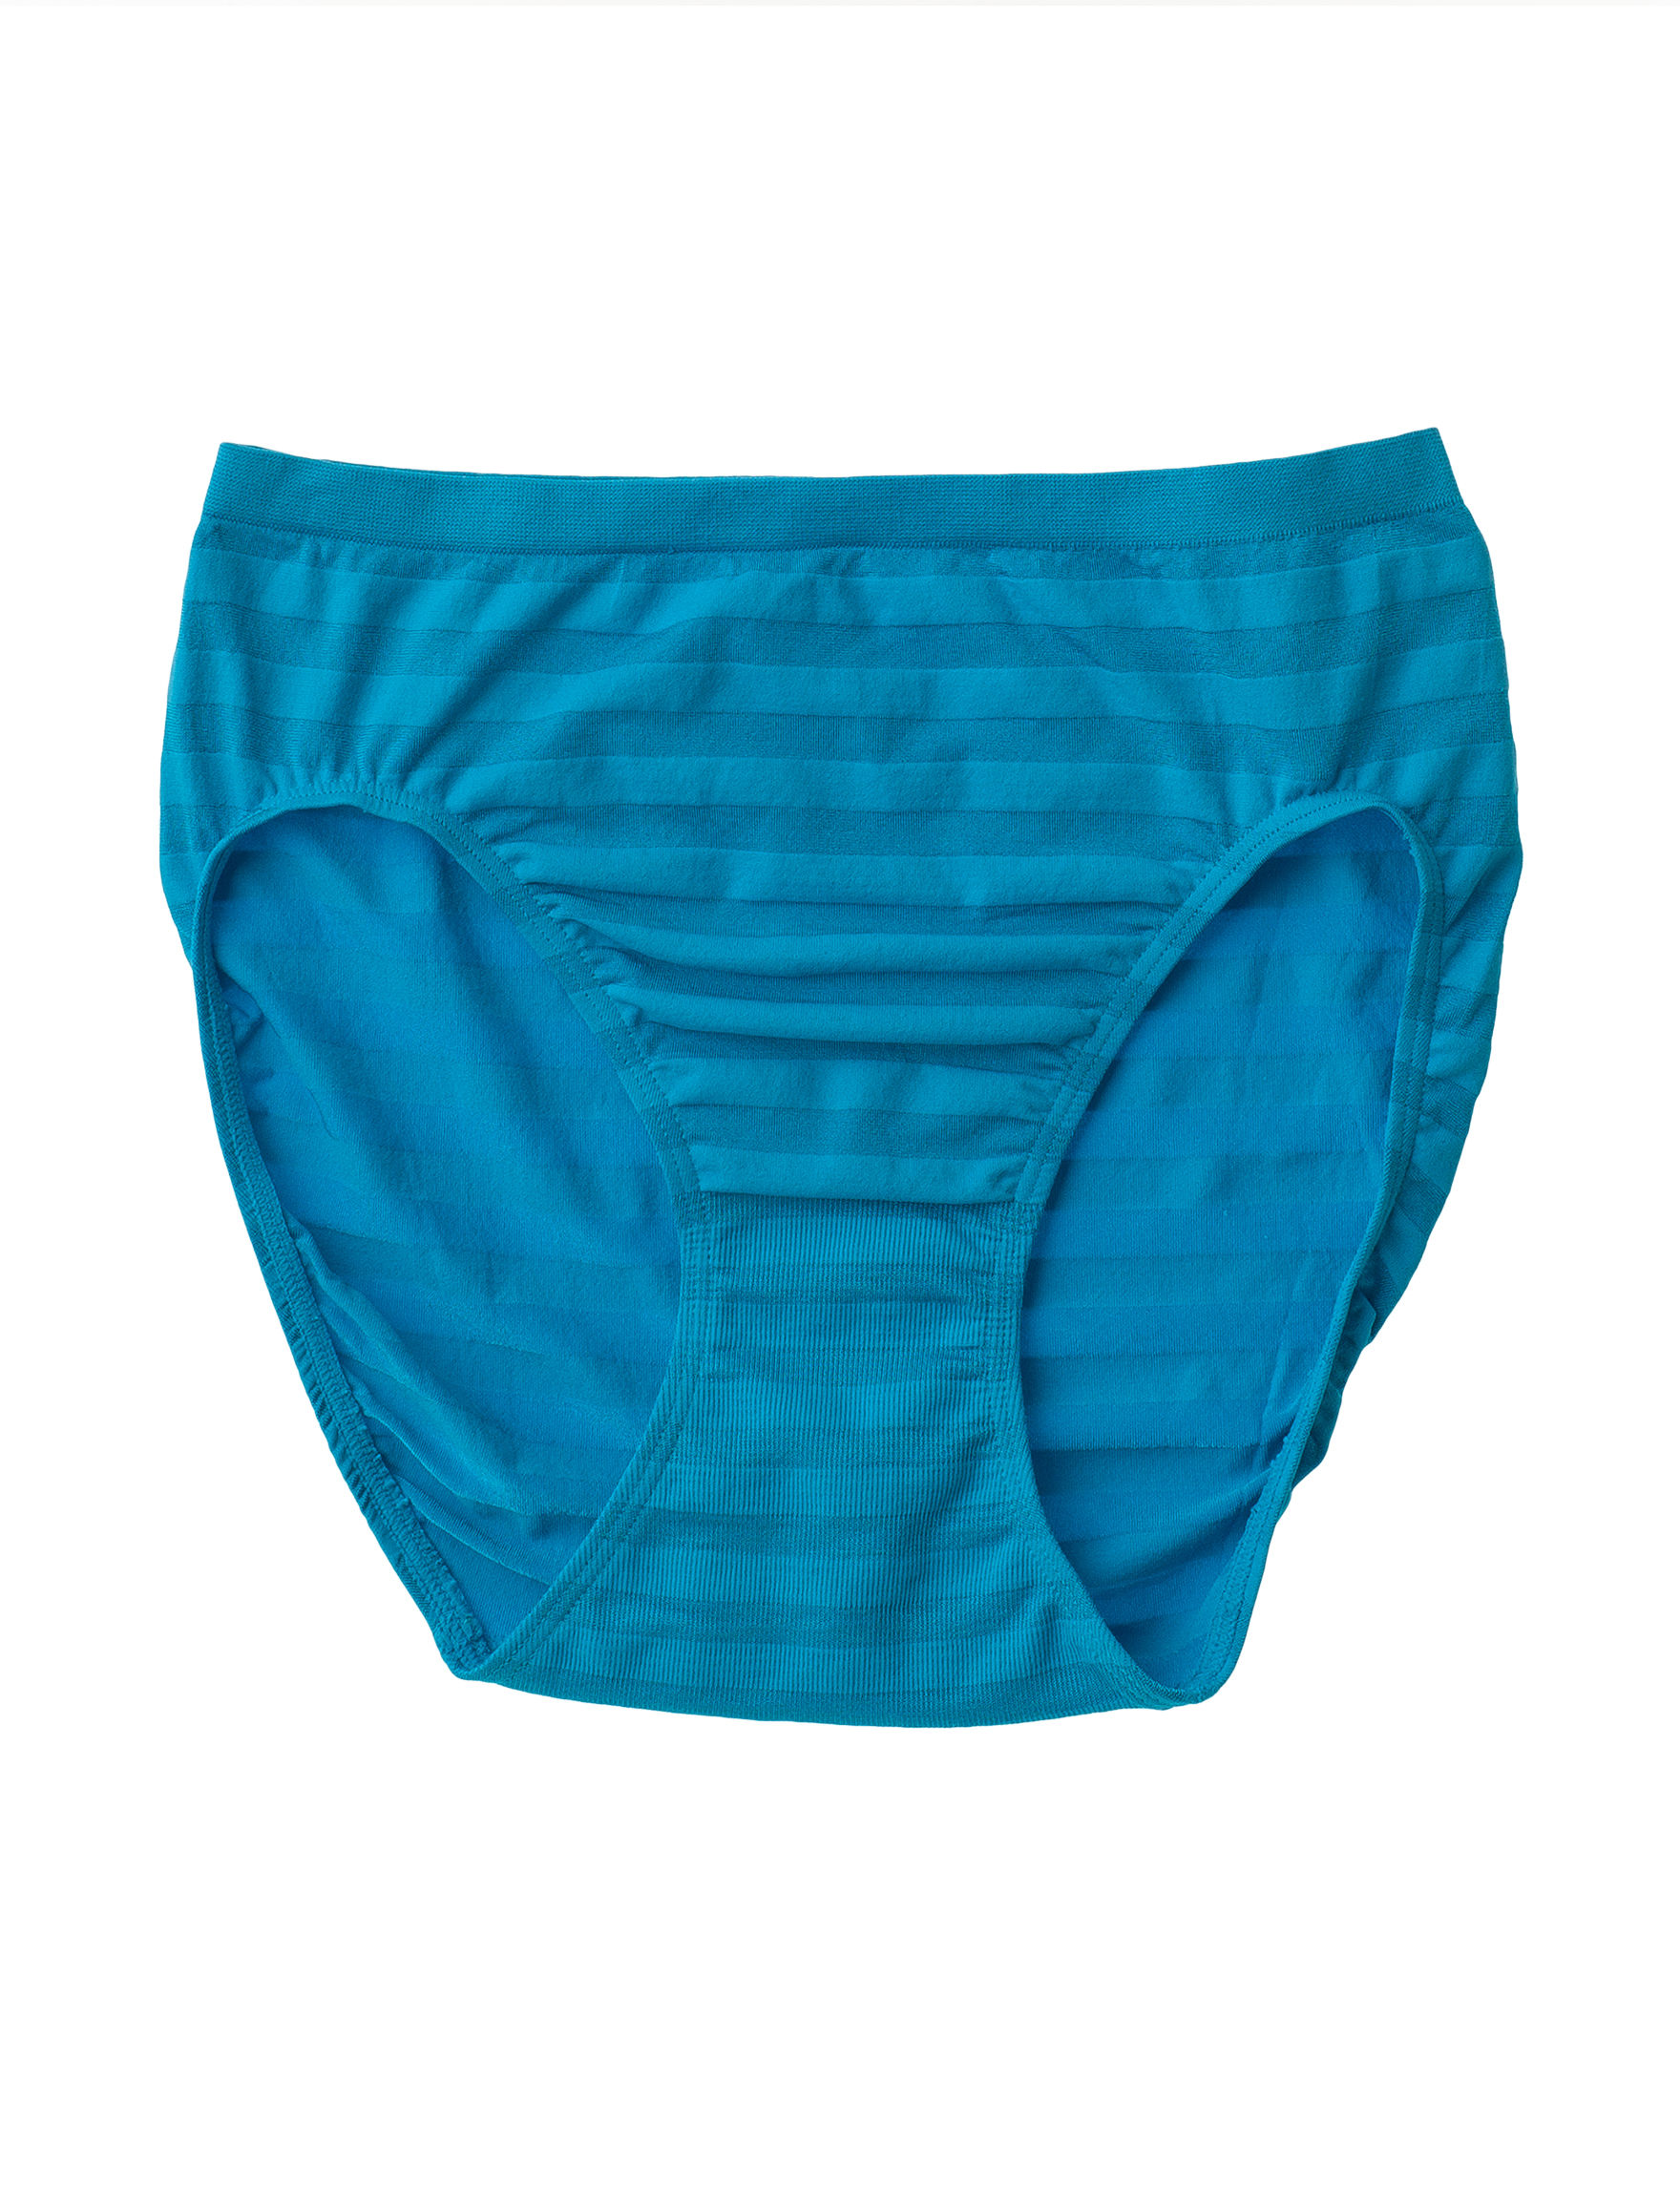 Jockey Turquoise Panties Bikini High Cut